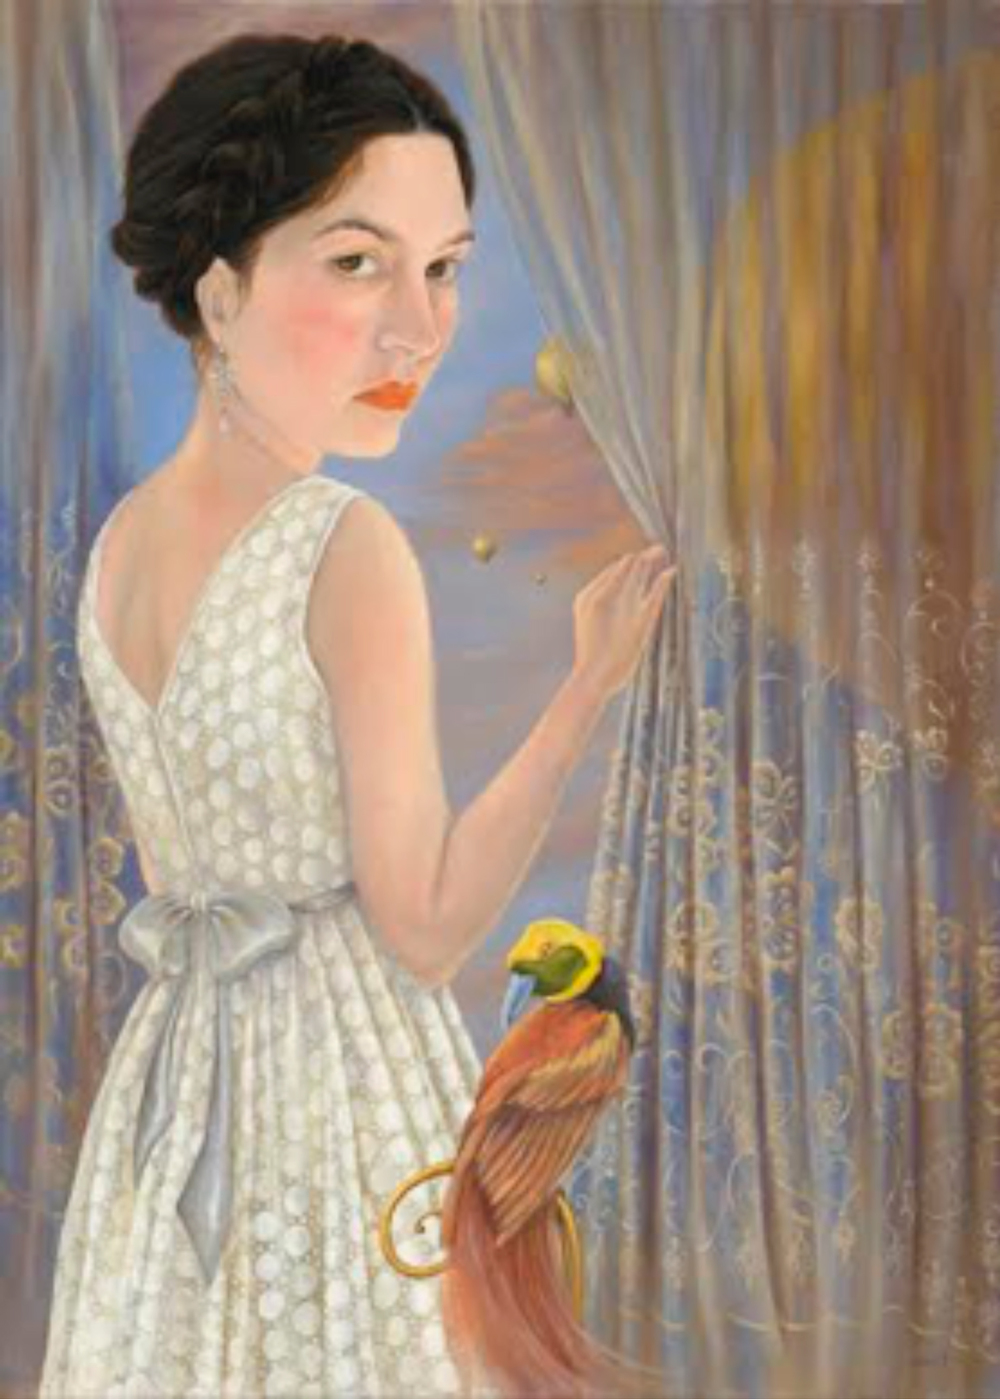 The Lady & the Bird